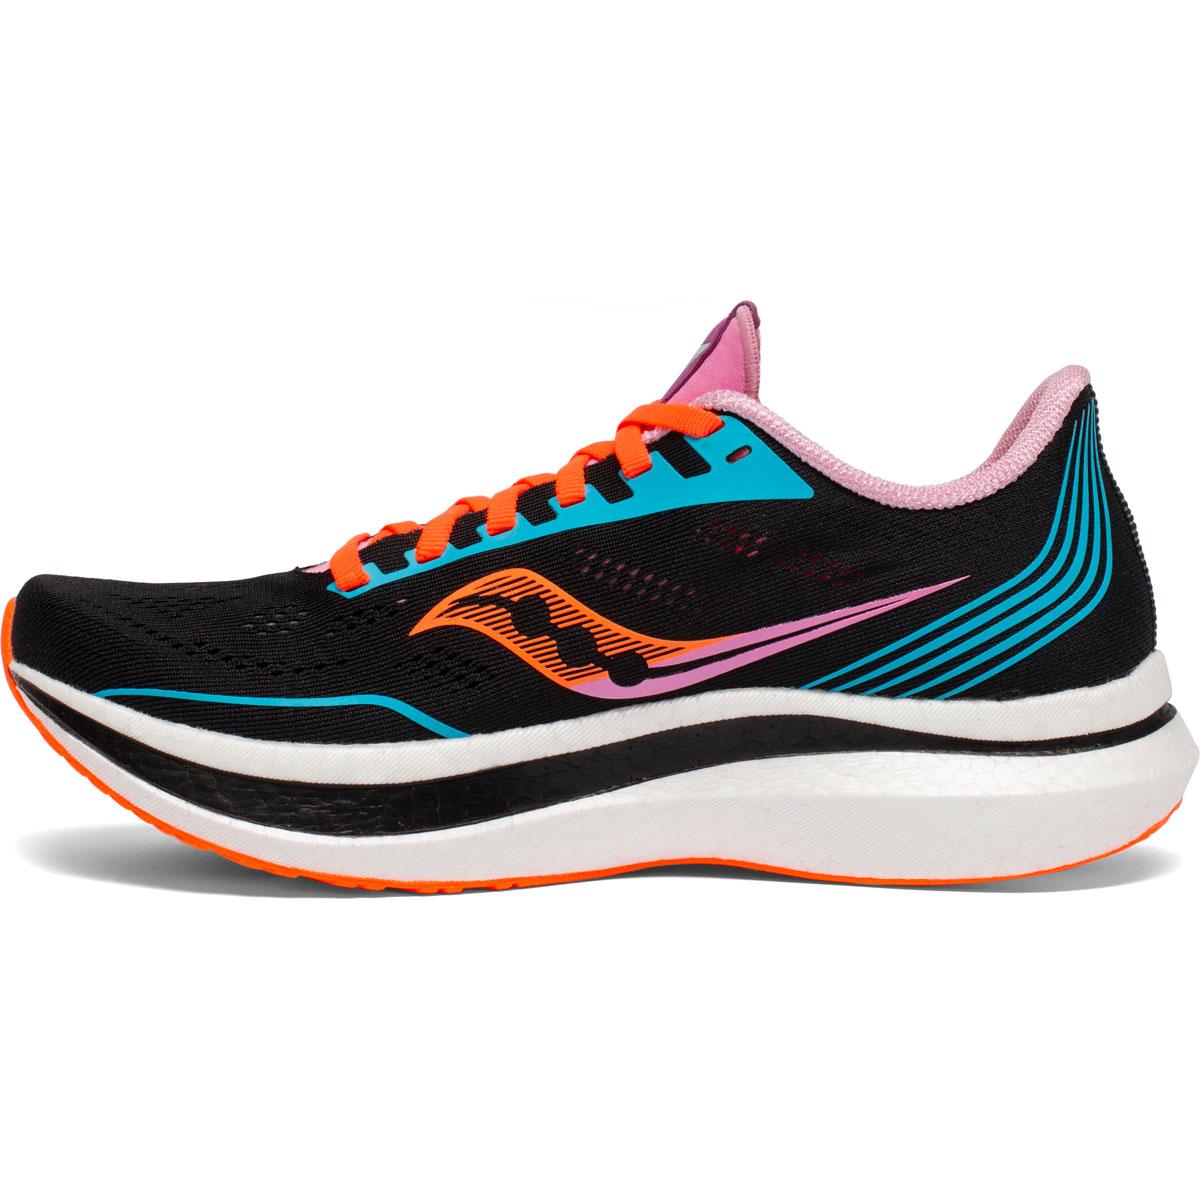 Women's Saucony Endorphin Pro Running Shoe - Color: Future/Black - Size: 5 - Width: Regular, Future/Black, large, image 2